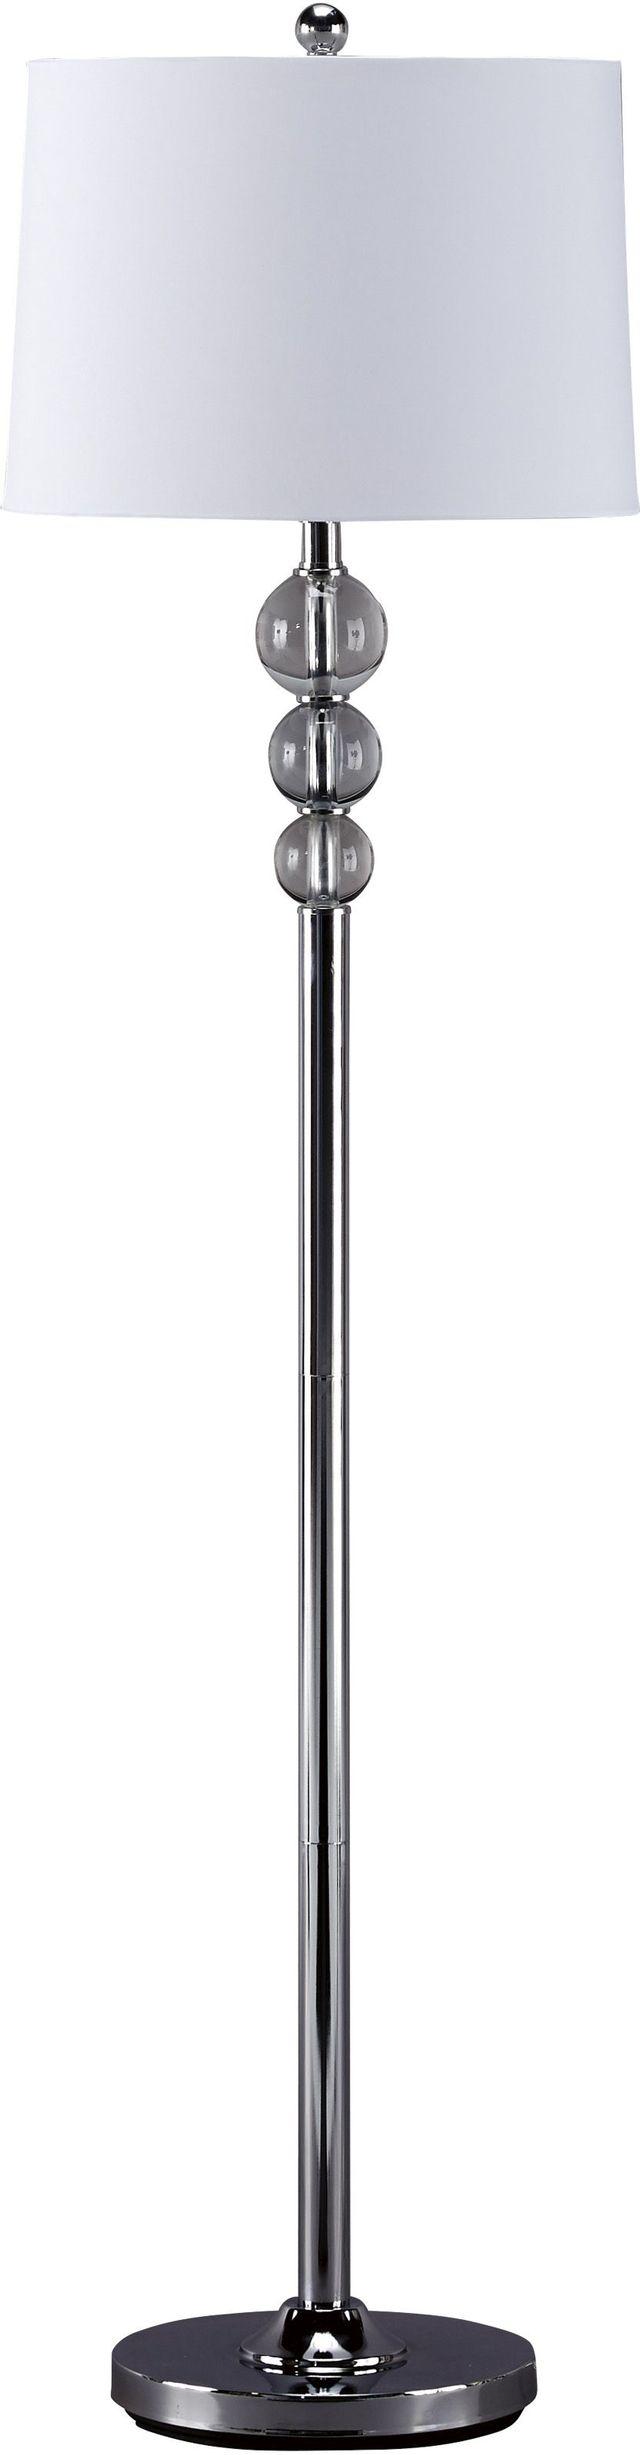 Signature Design by Ashley® Joaquin Clear/Chrome Floor Lamp-L428081